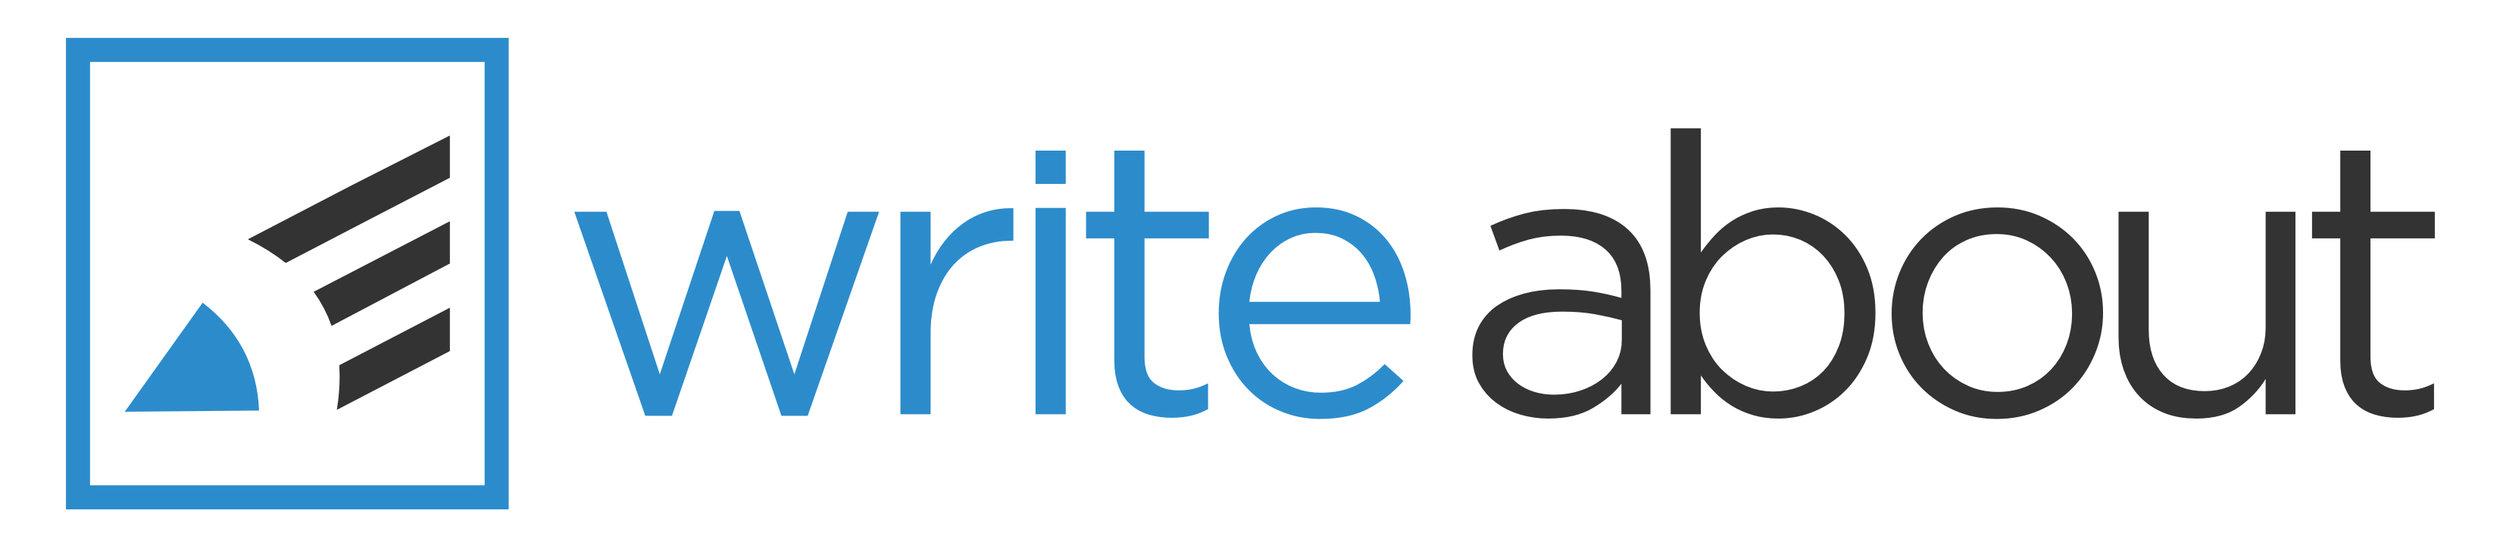 WriteAbout logo.jpg